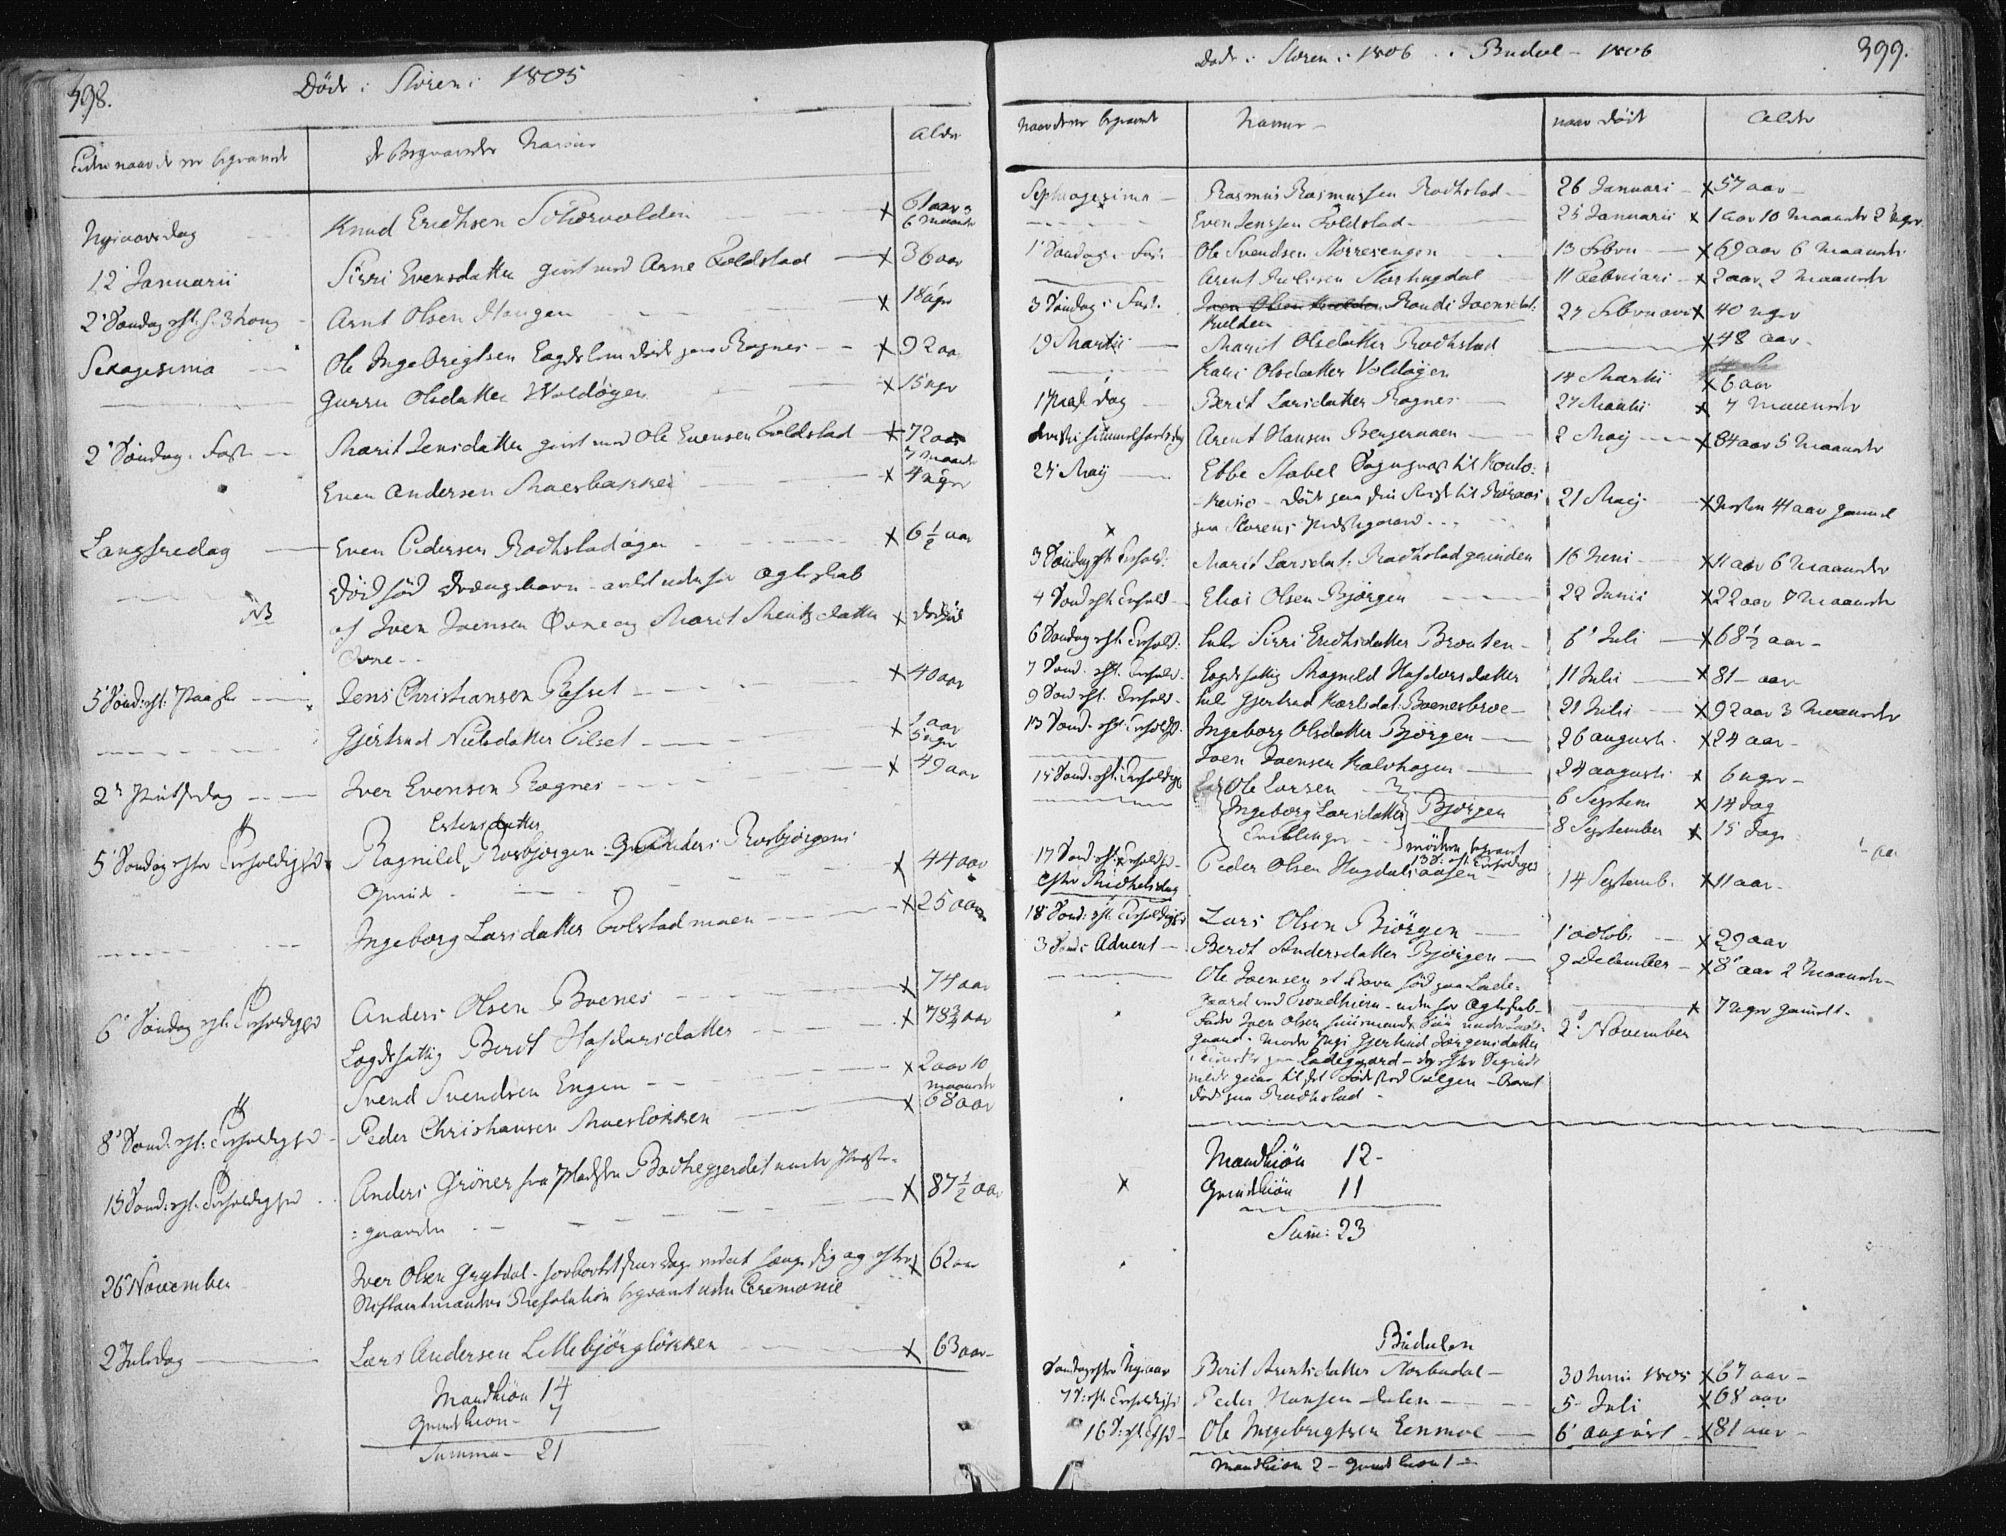 SAT, Ministerialprotokoller, klokkerbøker og fødselsregistre - Sør-Trøndelag, 687/L0992: Parish register (official) no. 687A03 /1, 1788-1815, p. 398-399